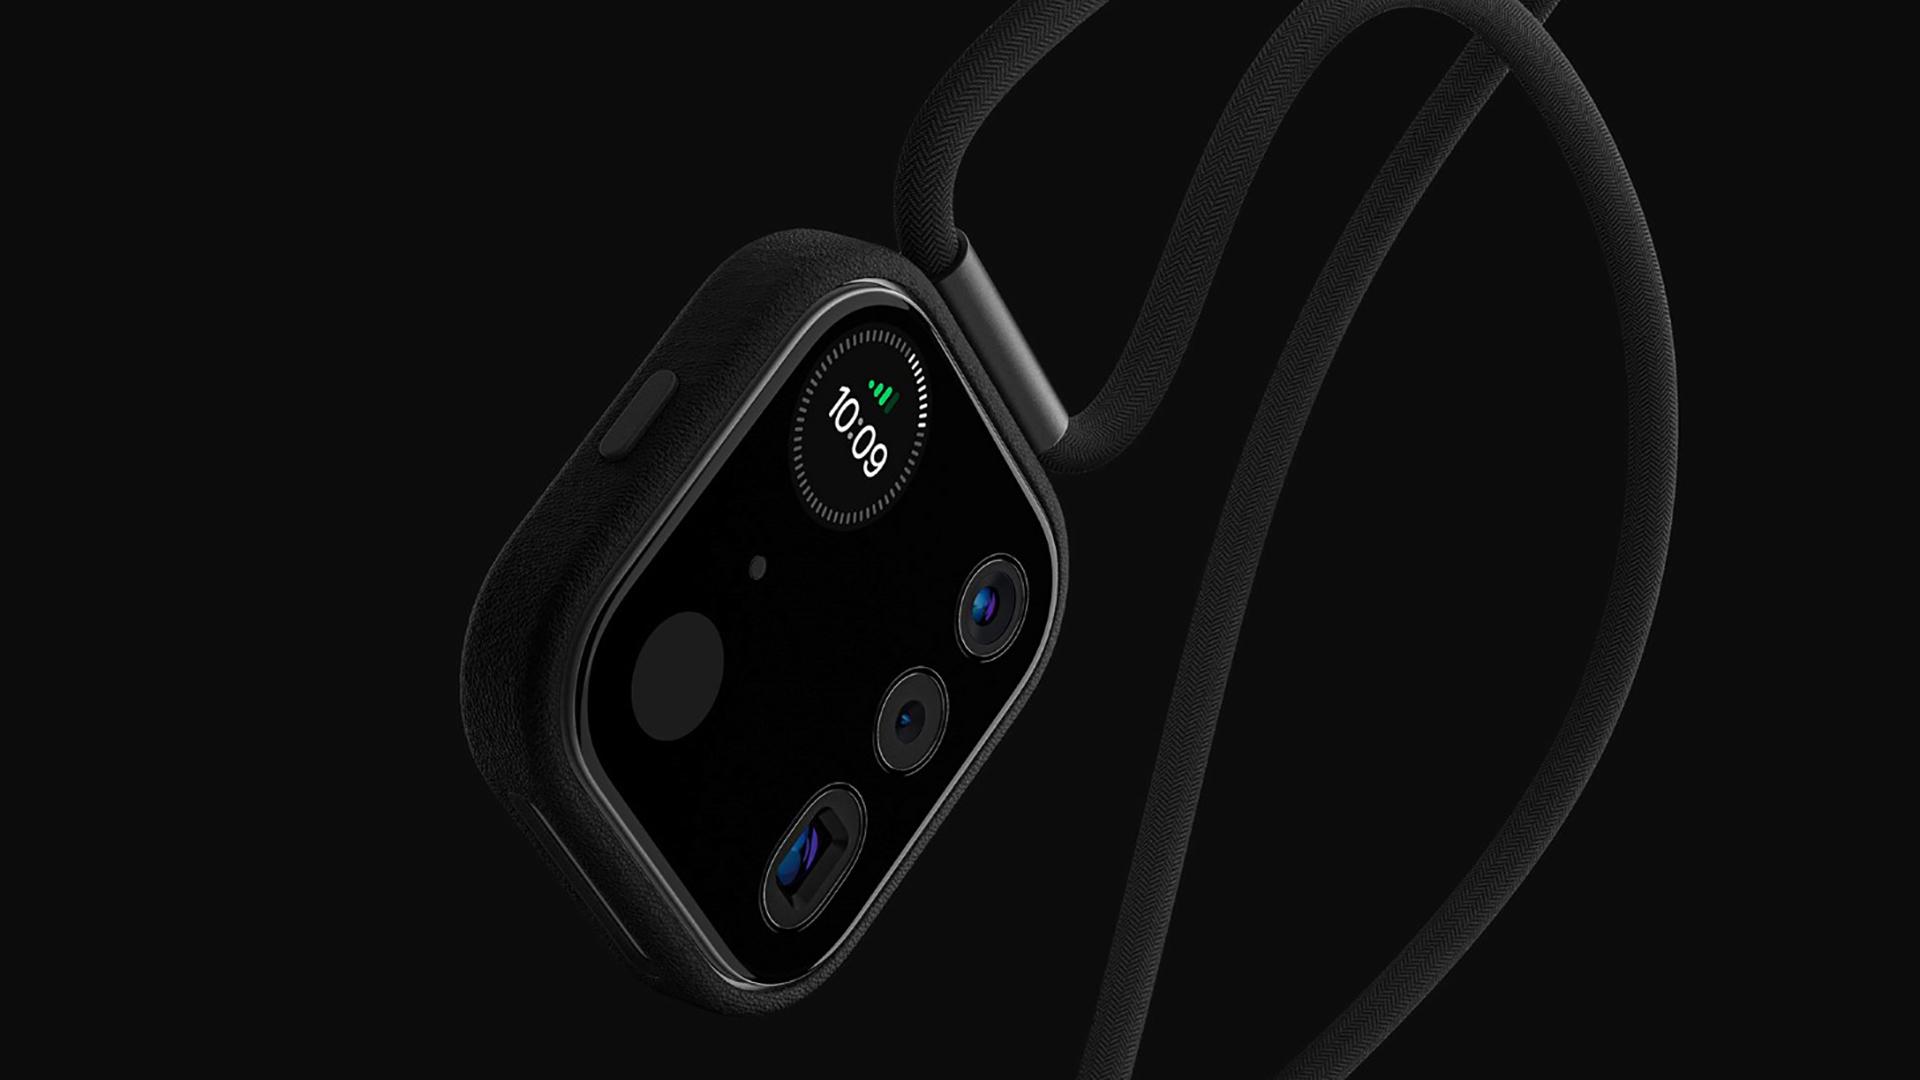 Detachable Smartphone Camera Concept 2